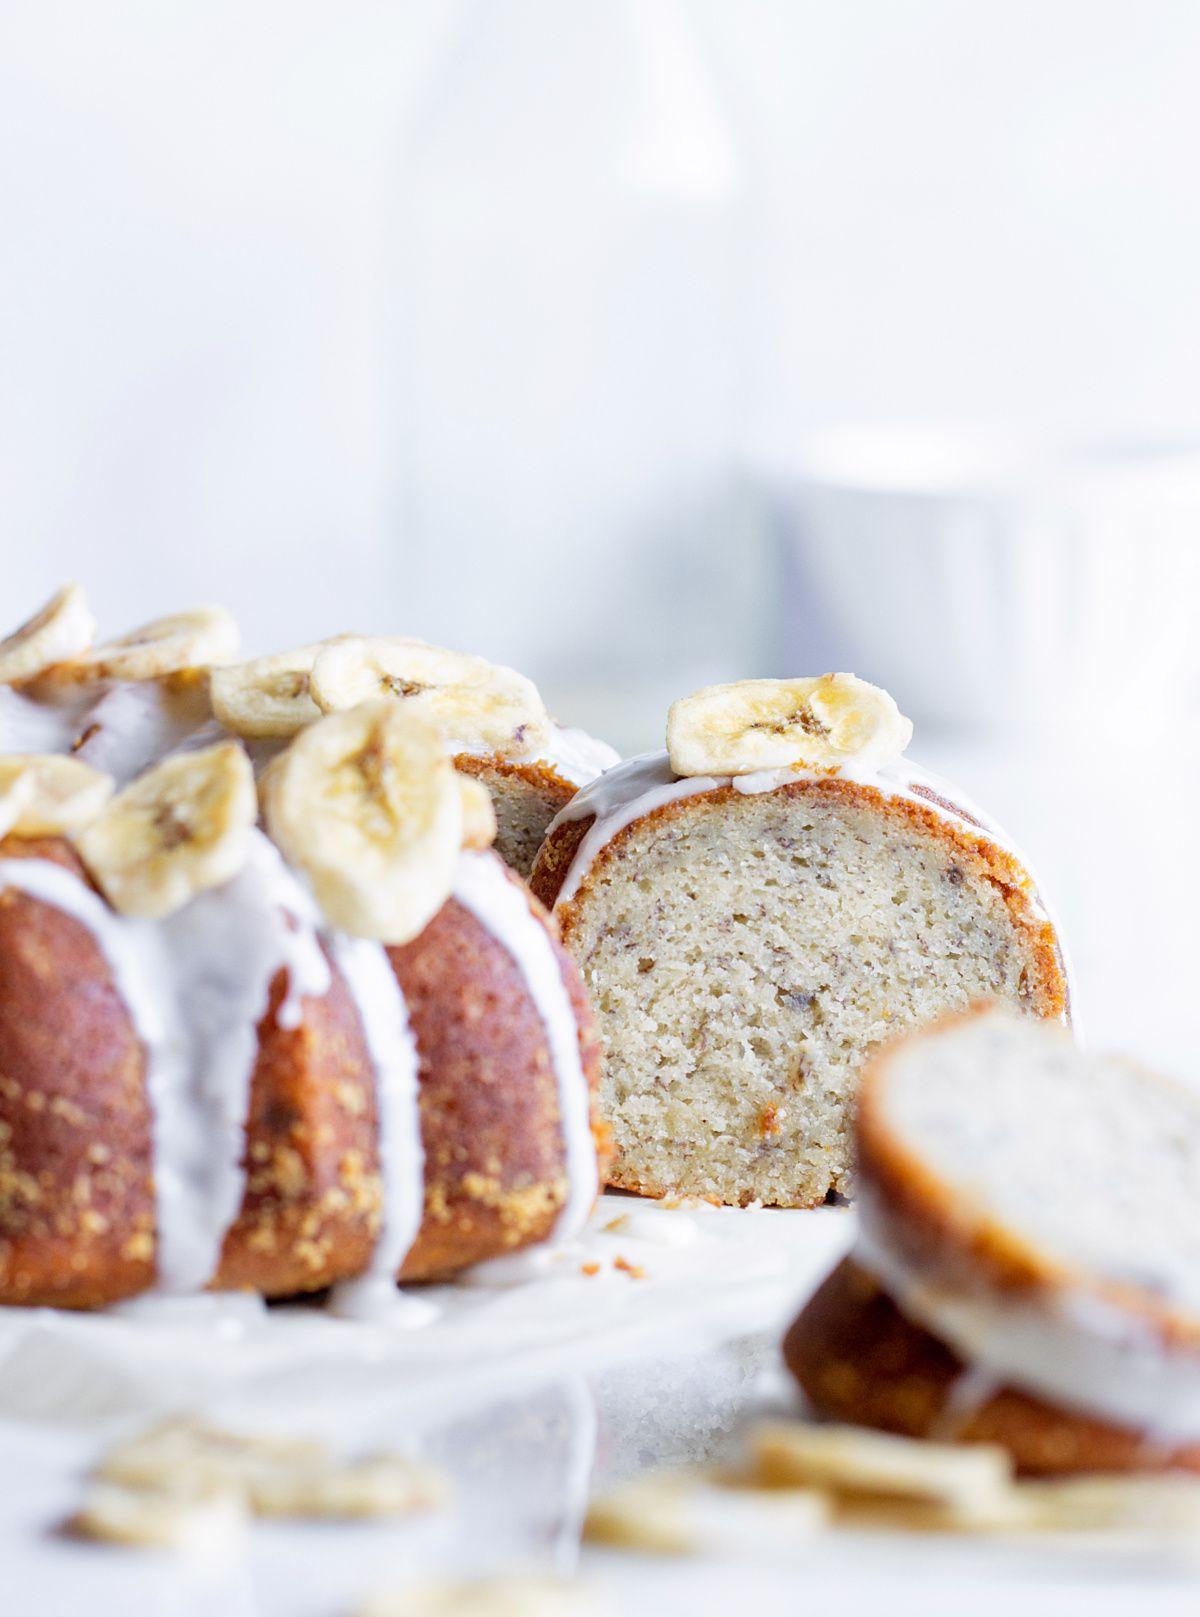 Buttermilk Banana Bundt Cake Recipe In 2020 Banana Bundt Banana Bundt Cake Bundt Cake